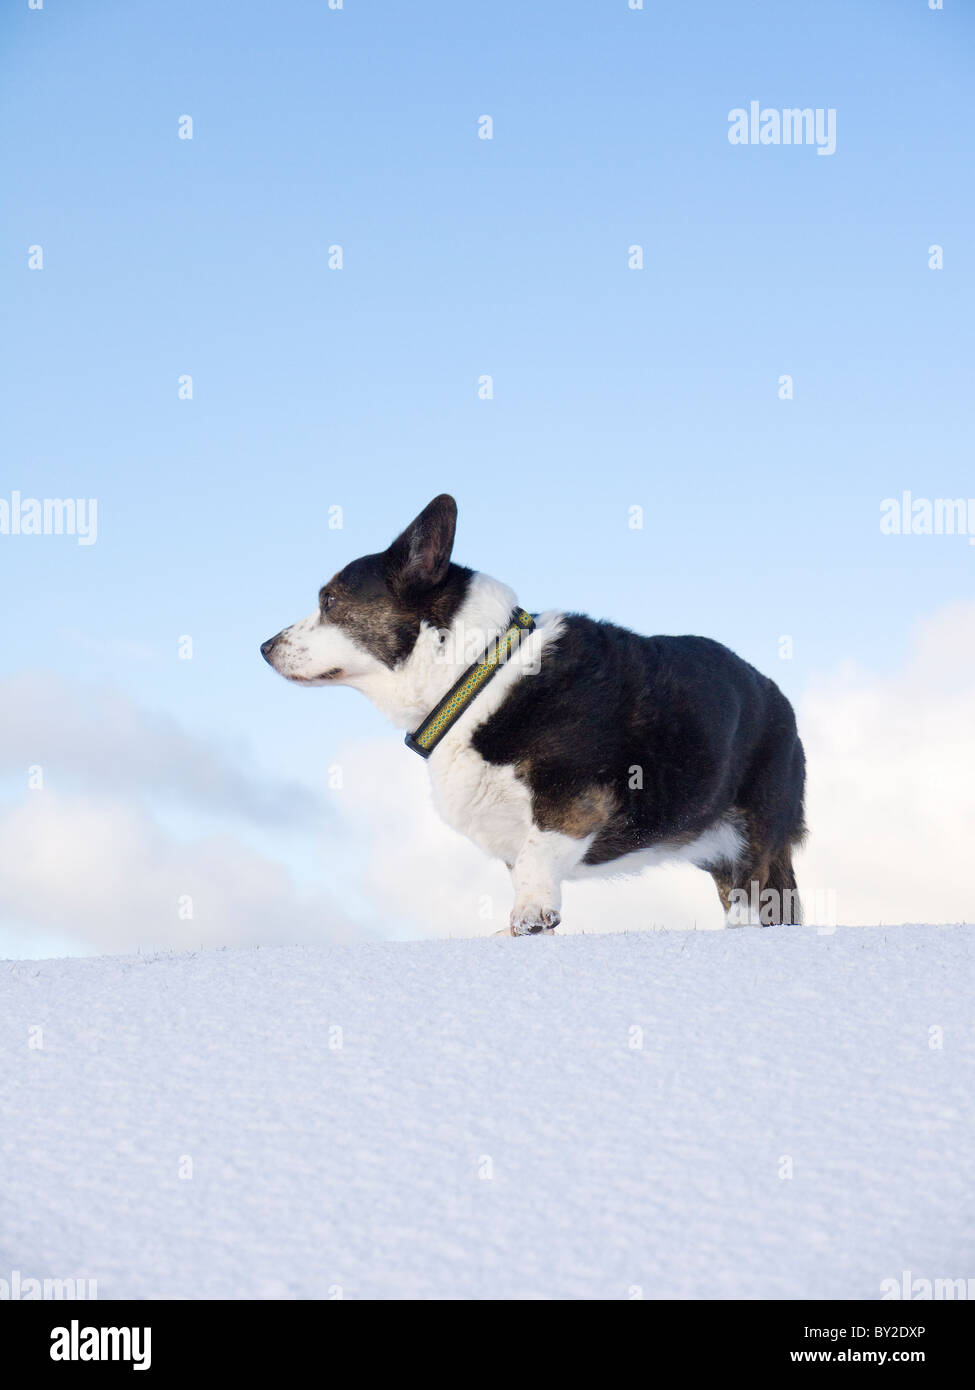 A female cardigan corgi (dog) in the snow in Scotland. - Stock Image